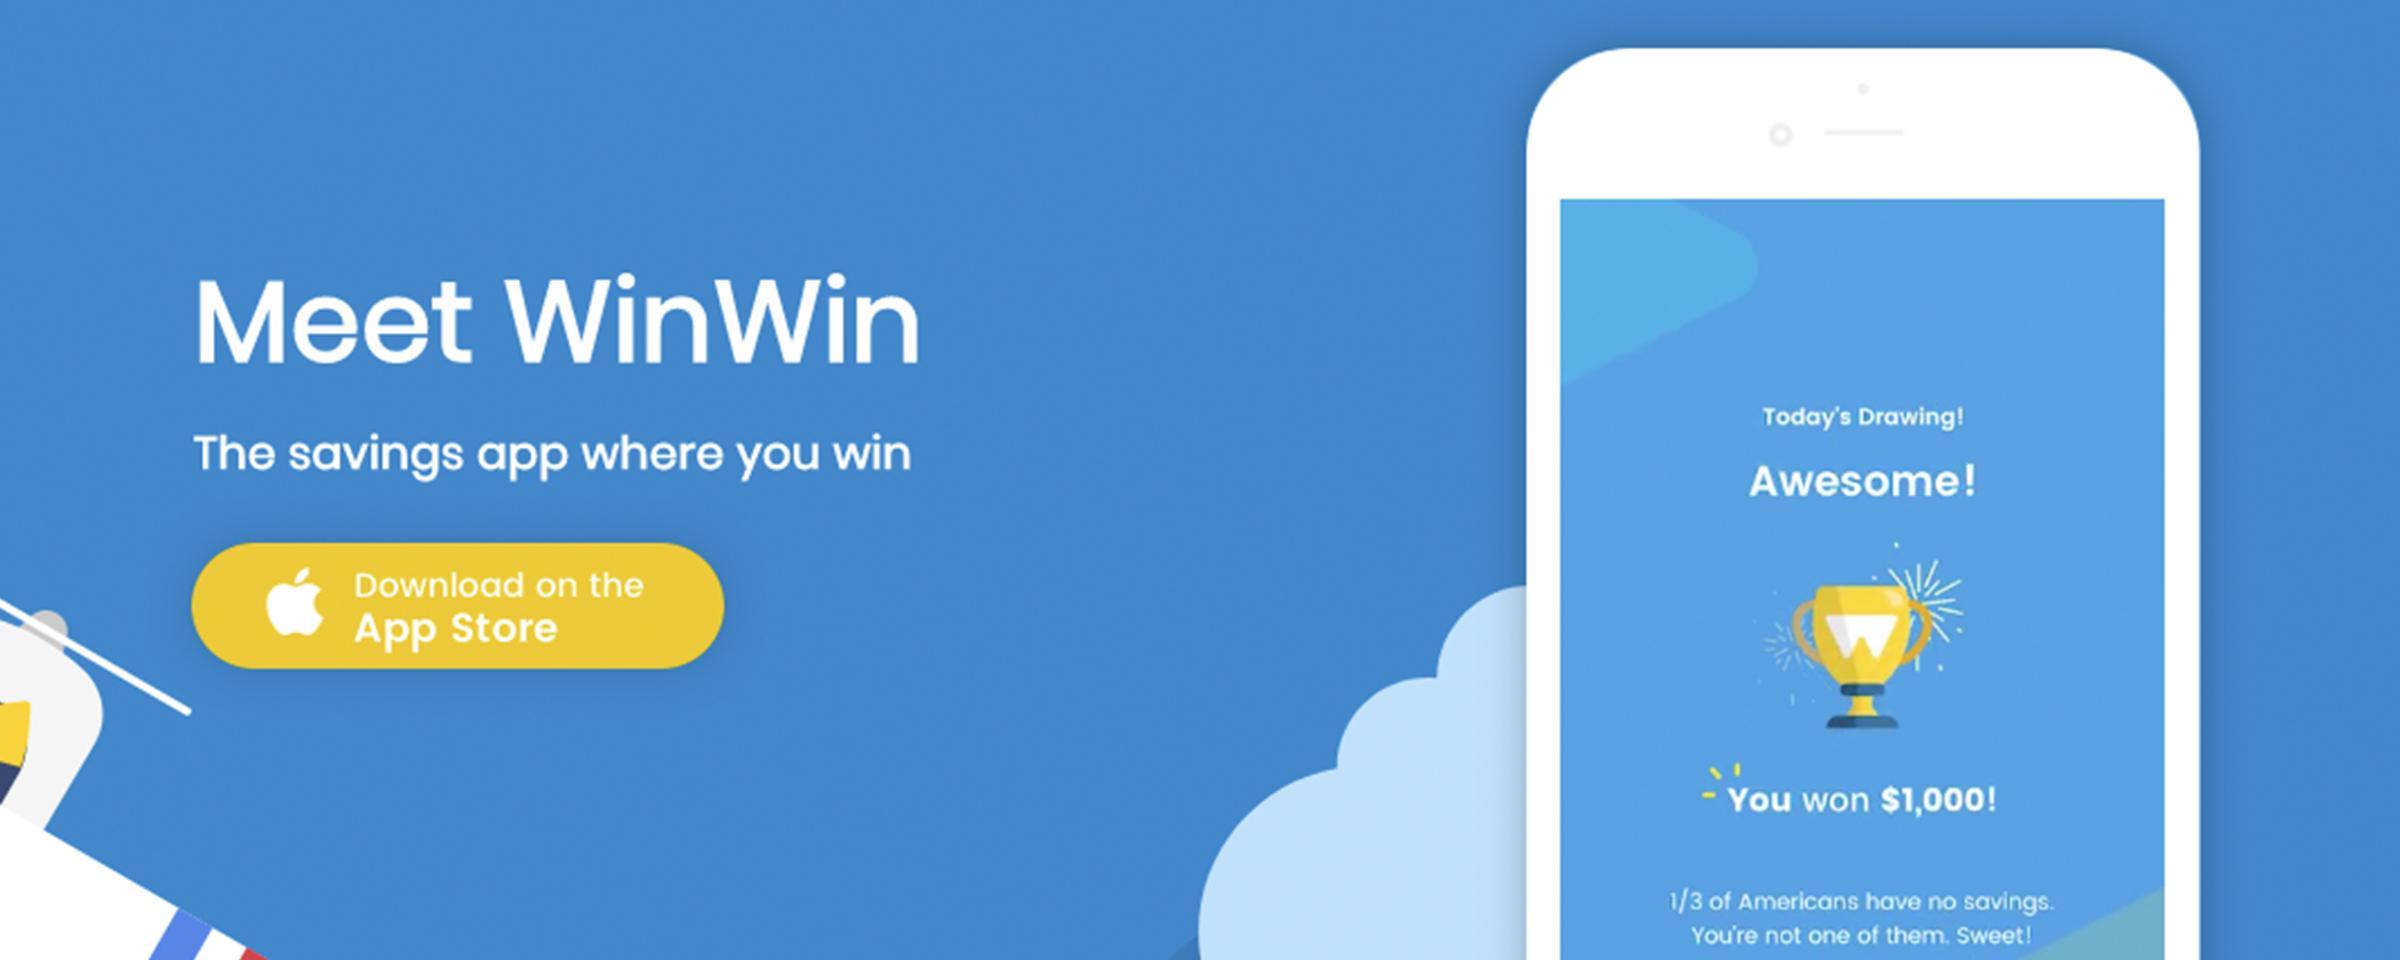 Winwin Turns Your Savings Into Lotto Tickets Futurevision R Ga